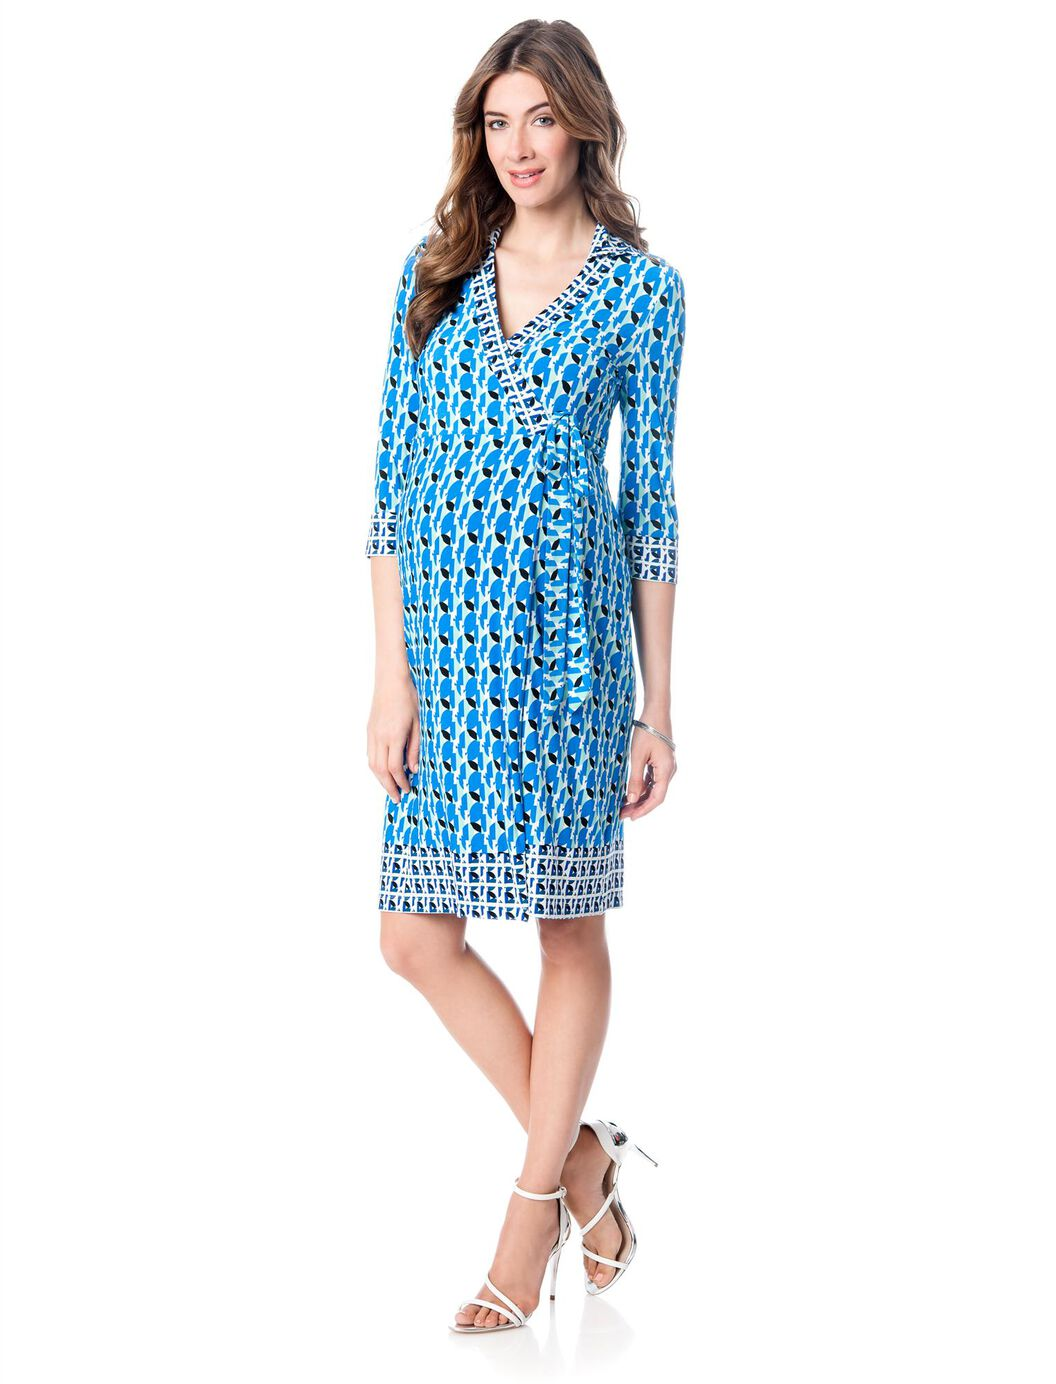 Ivy blu wrap maternity dress a pea in the pod maternity ivy amp blu wrap maternity dress blue combo ombrellifo Choice Image